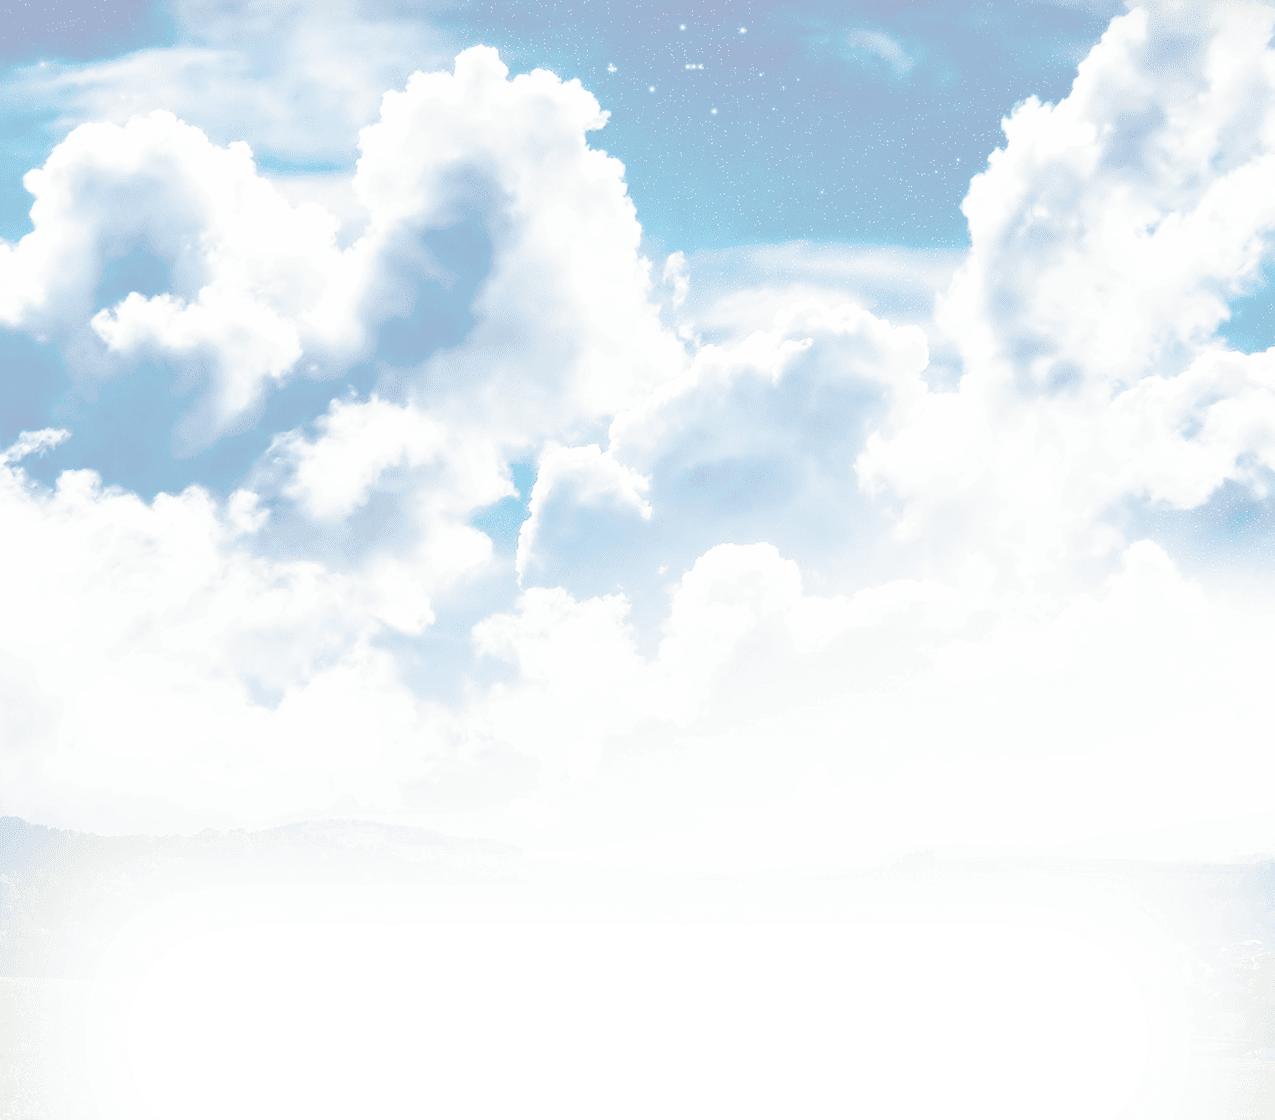 Cloud Png Image Cloud Png Transparent Free Download Image Cloud Clouds Image